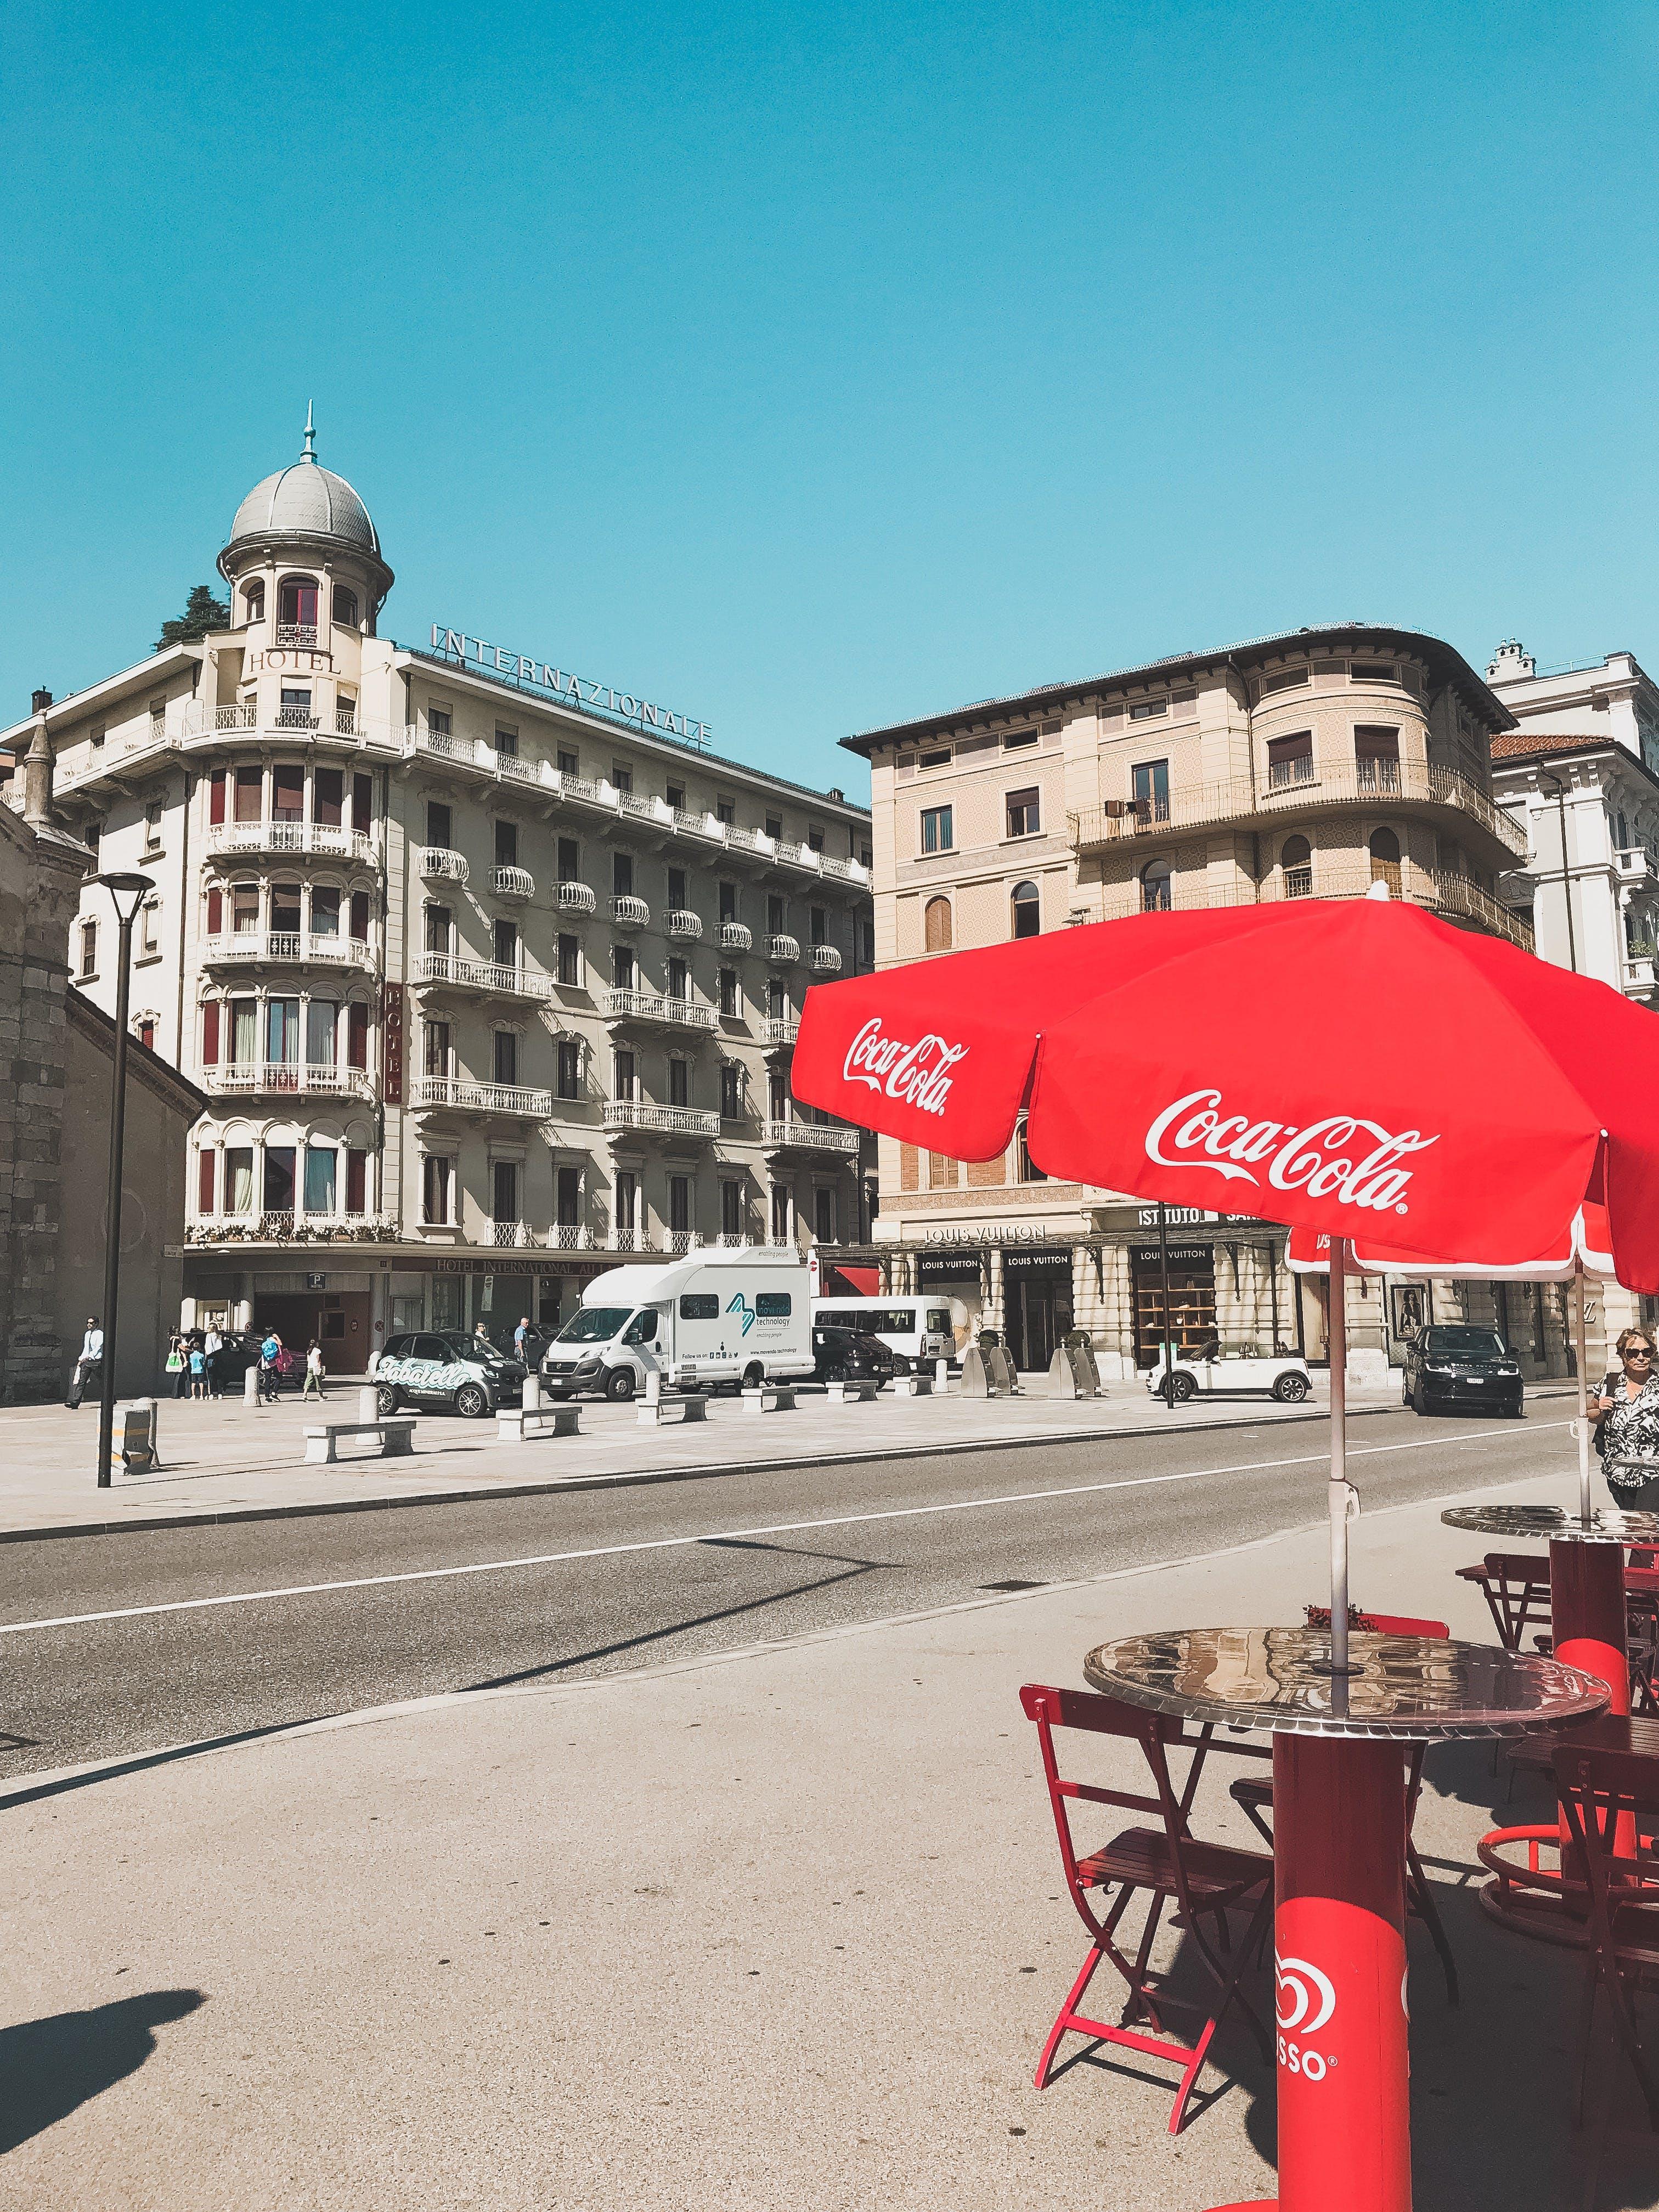 Red Coca-cola Patio Umbrella